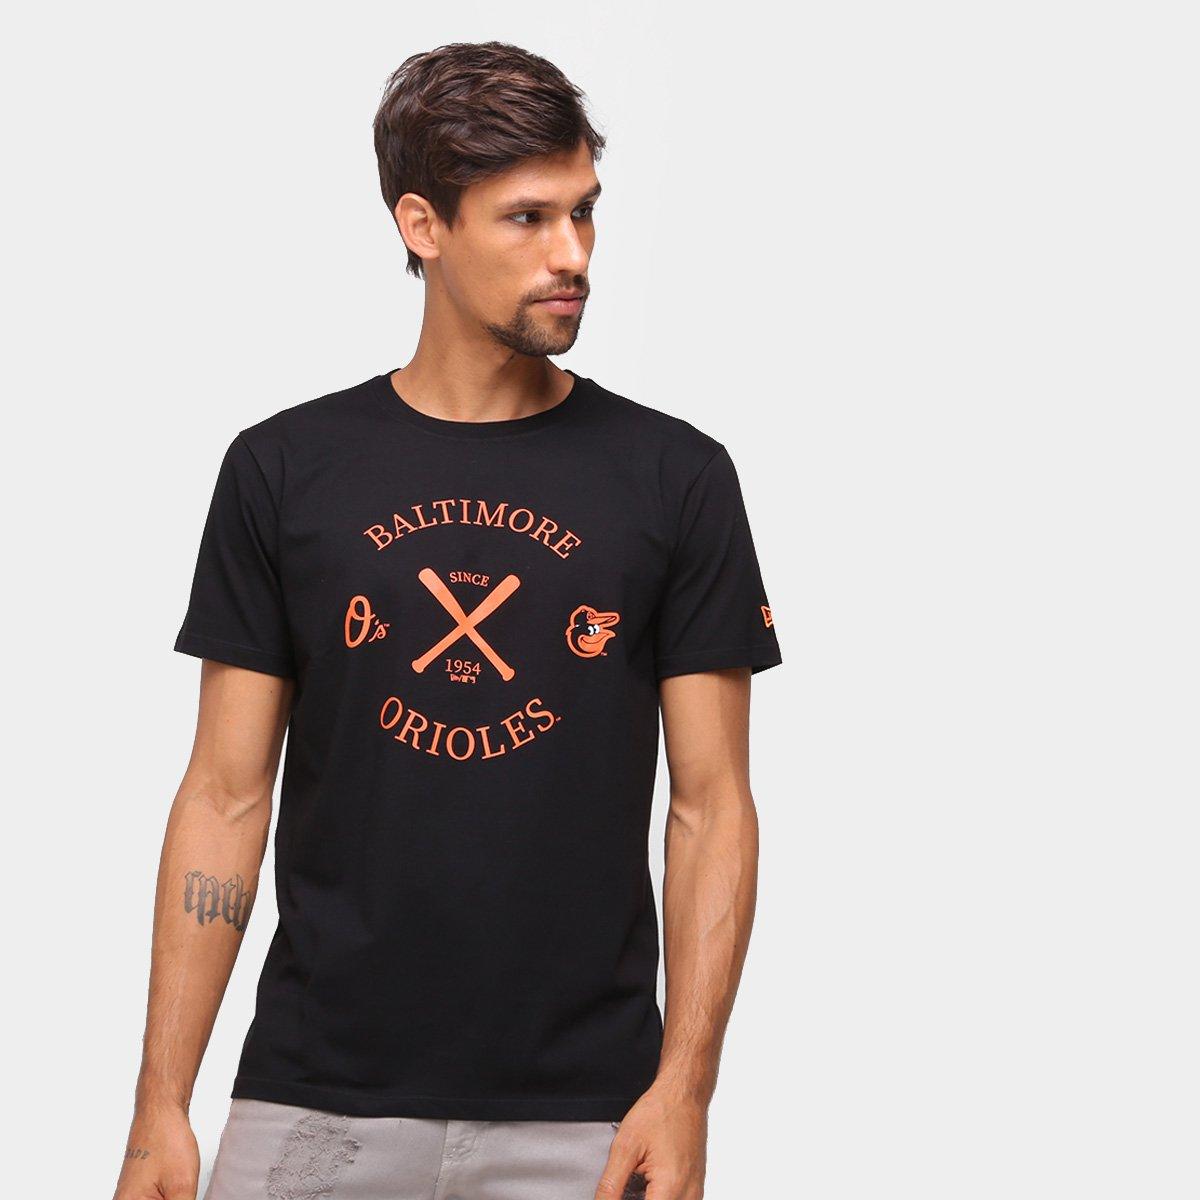 Camiseta MLB Baltimore Orioles New Era College Masculina